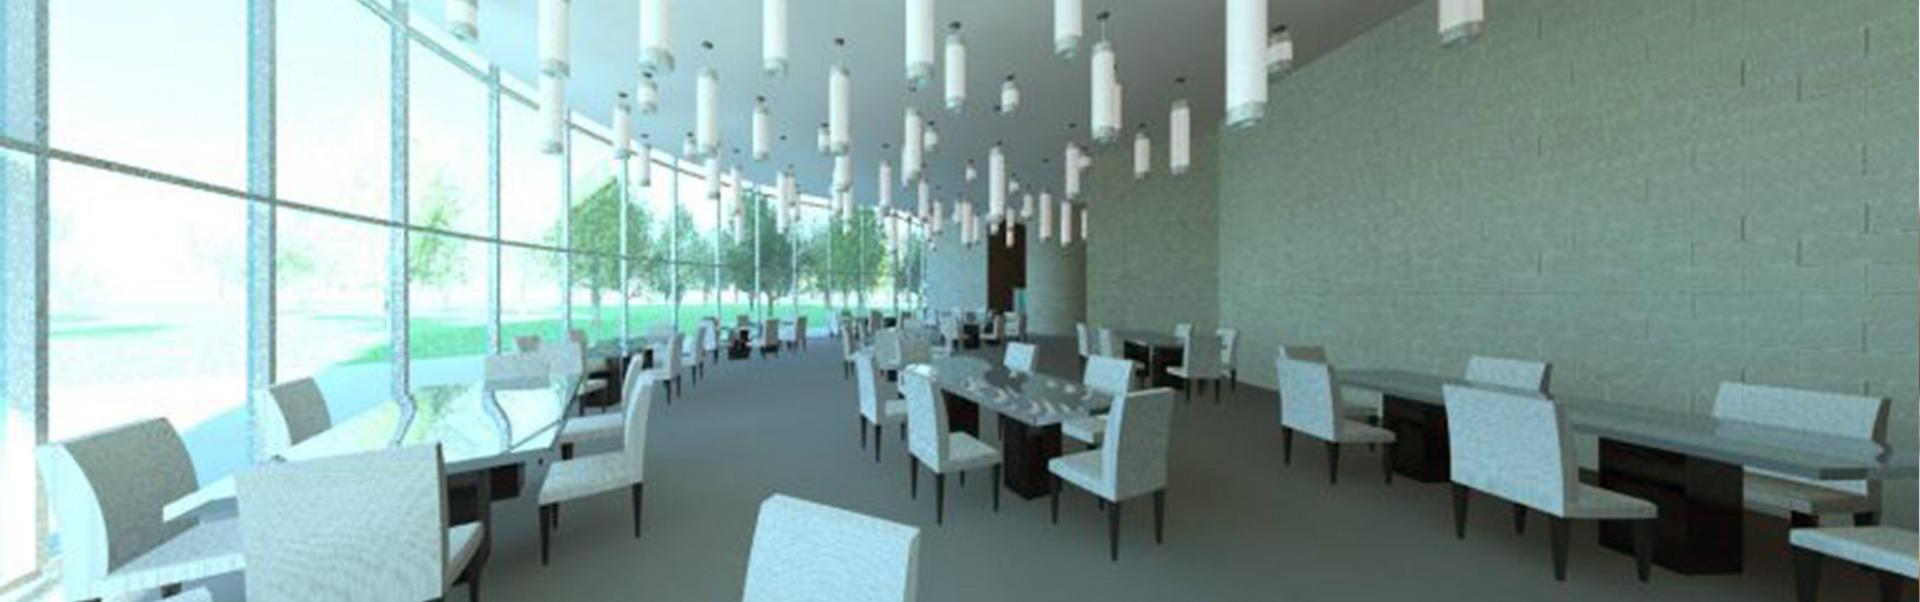 Rendering of interior dining area restaurant